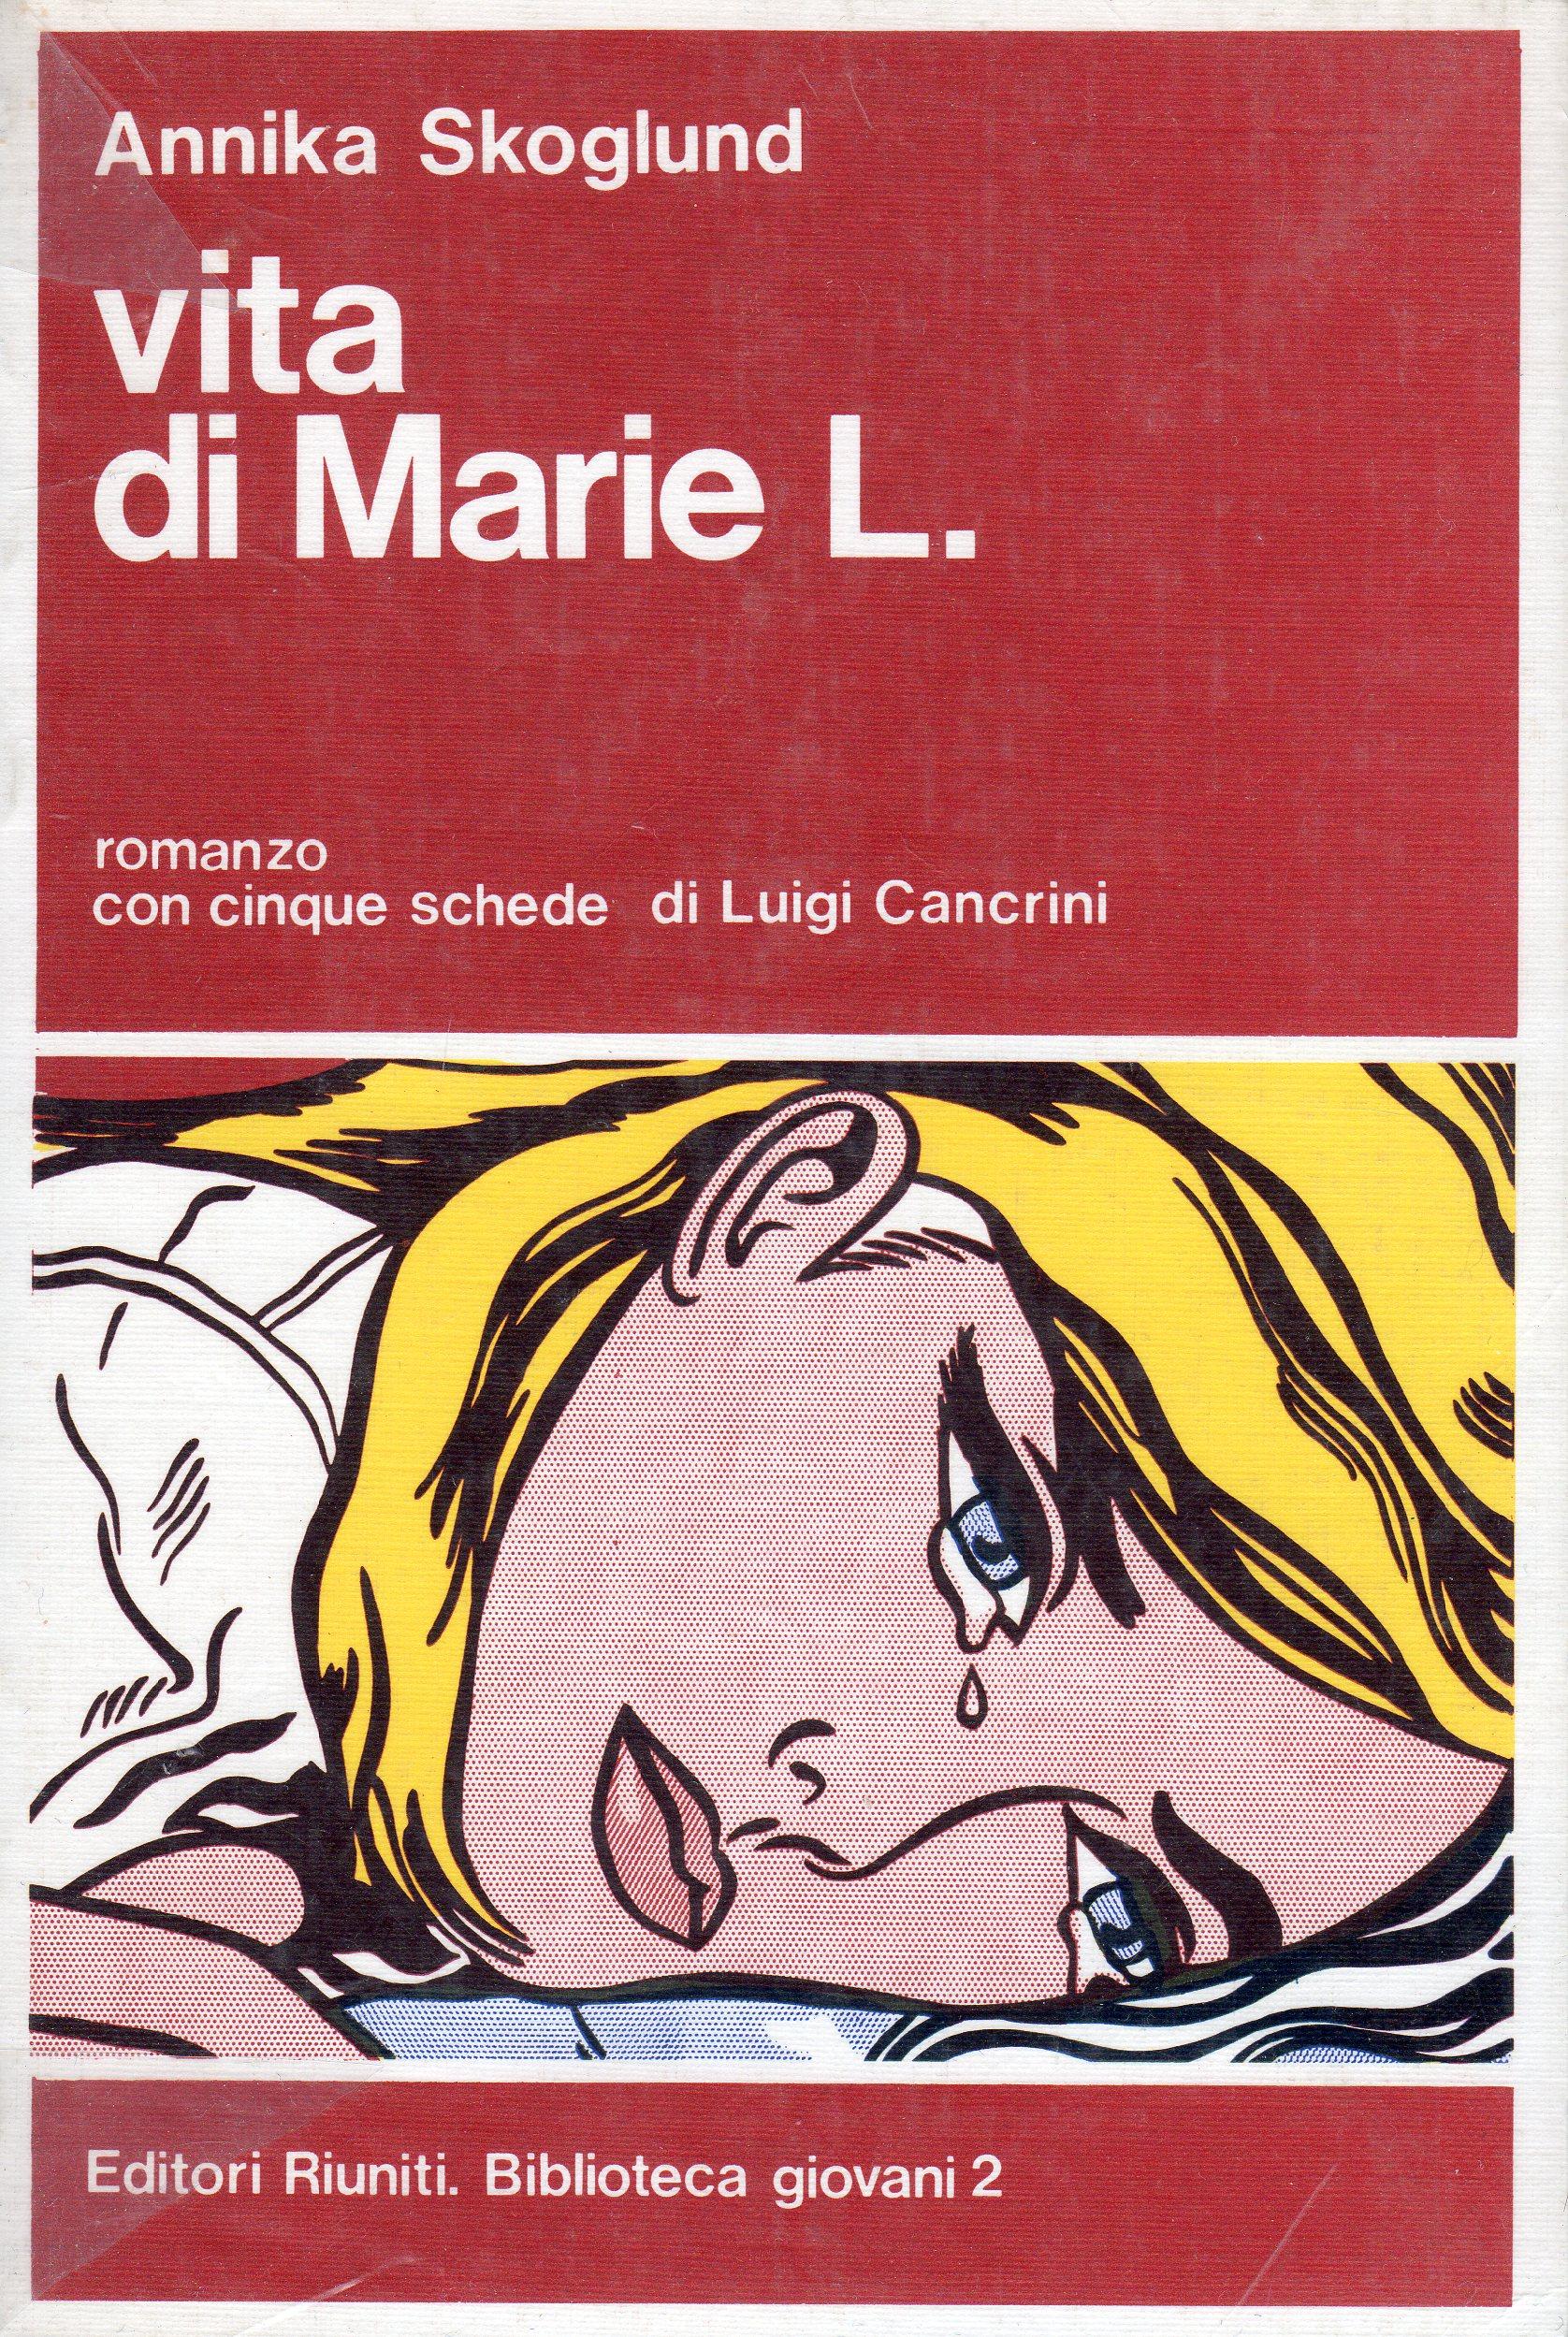 Image of Vita di Marie L.